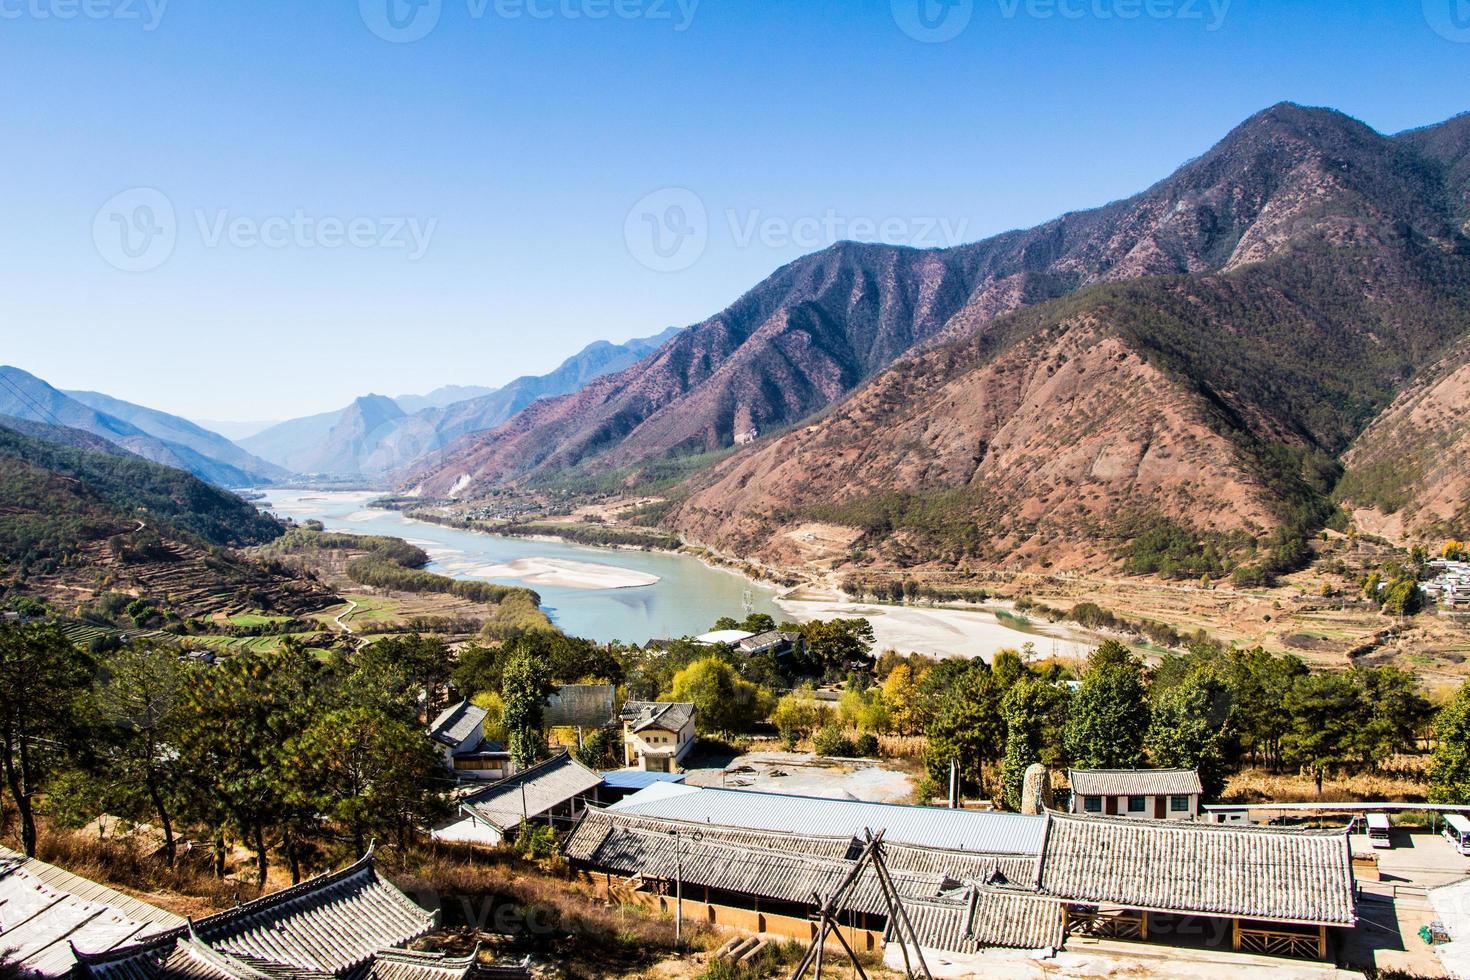 första kurvan yangtze-floden foto